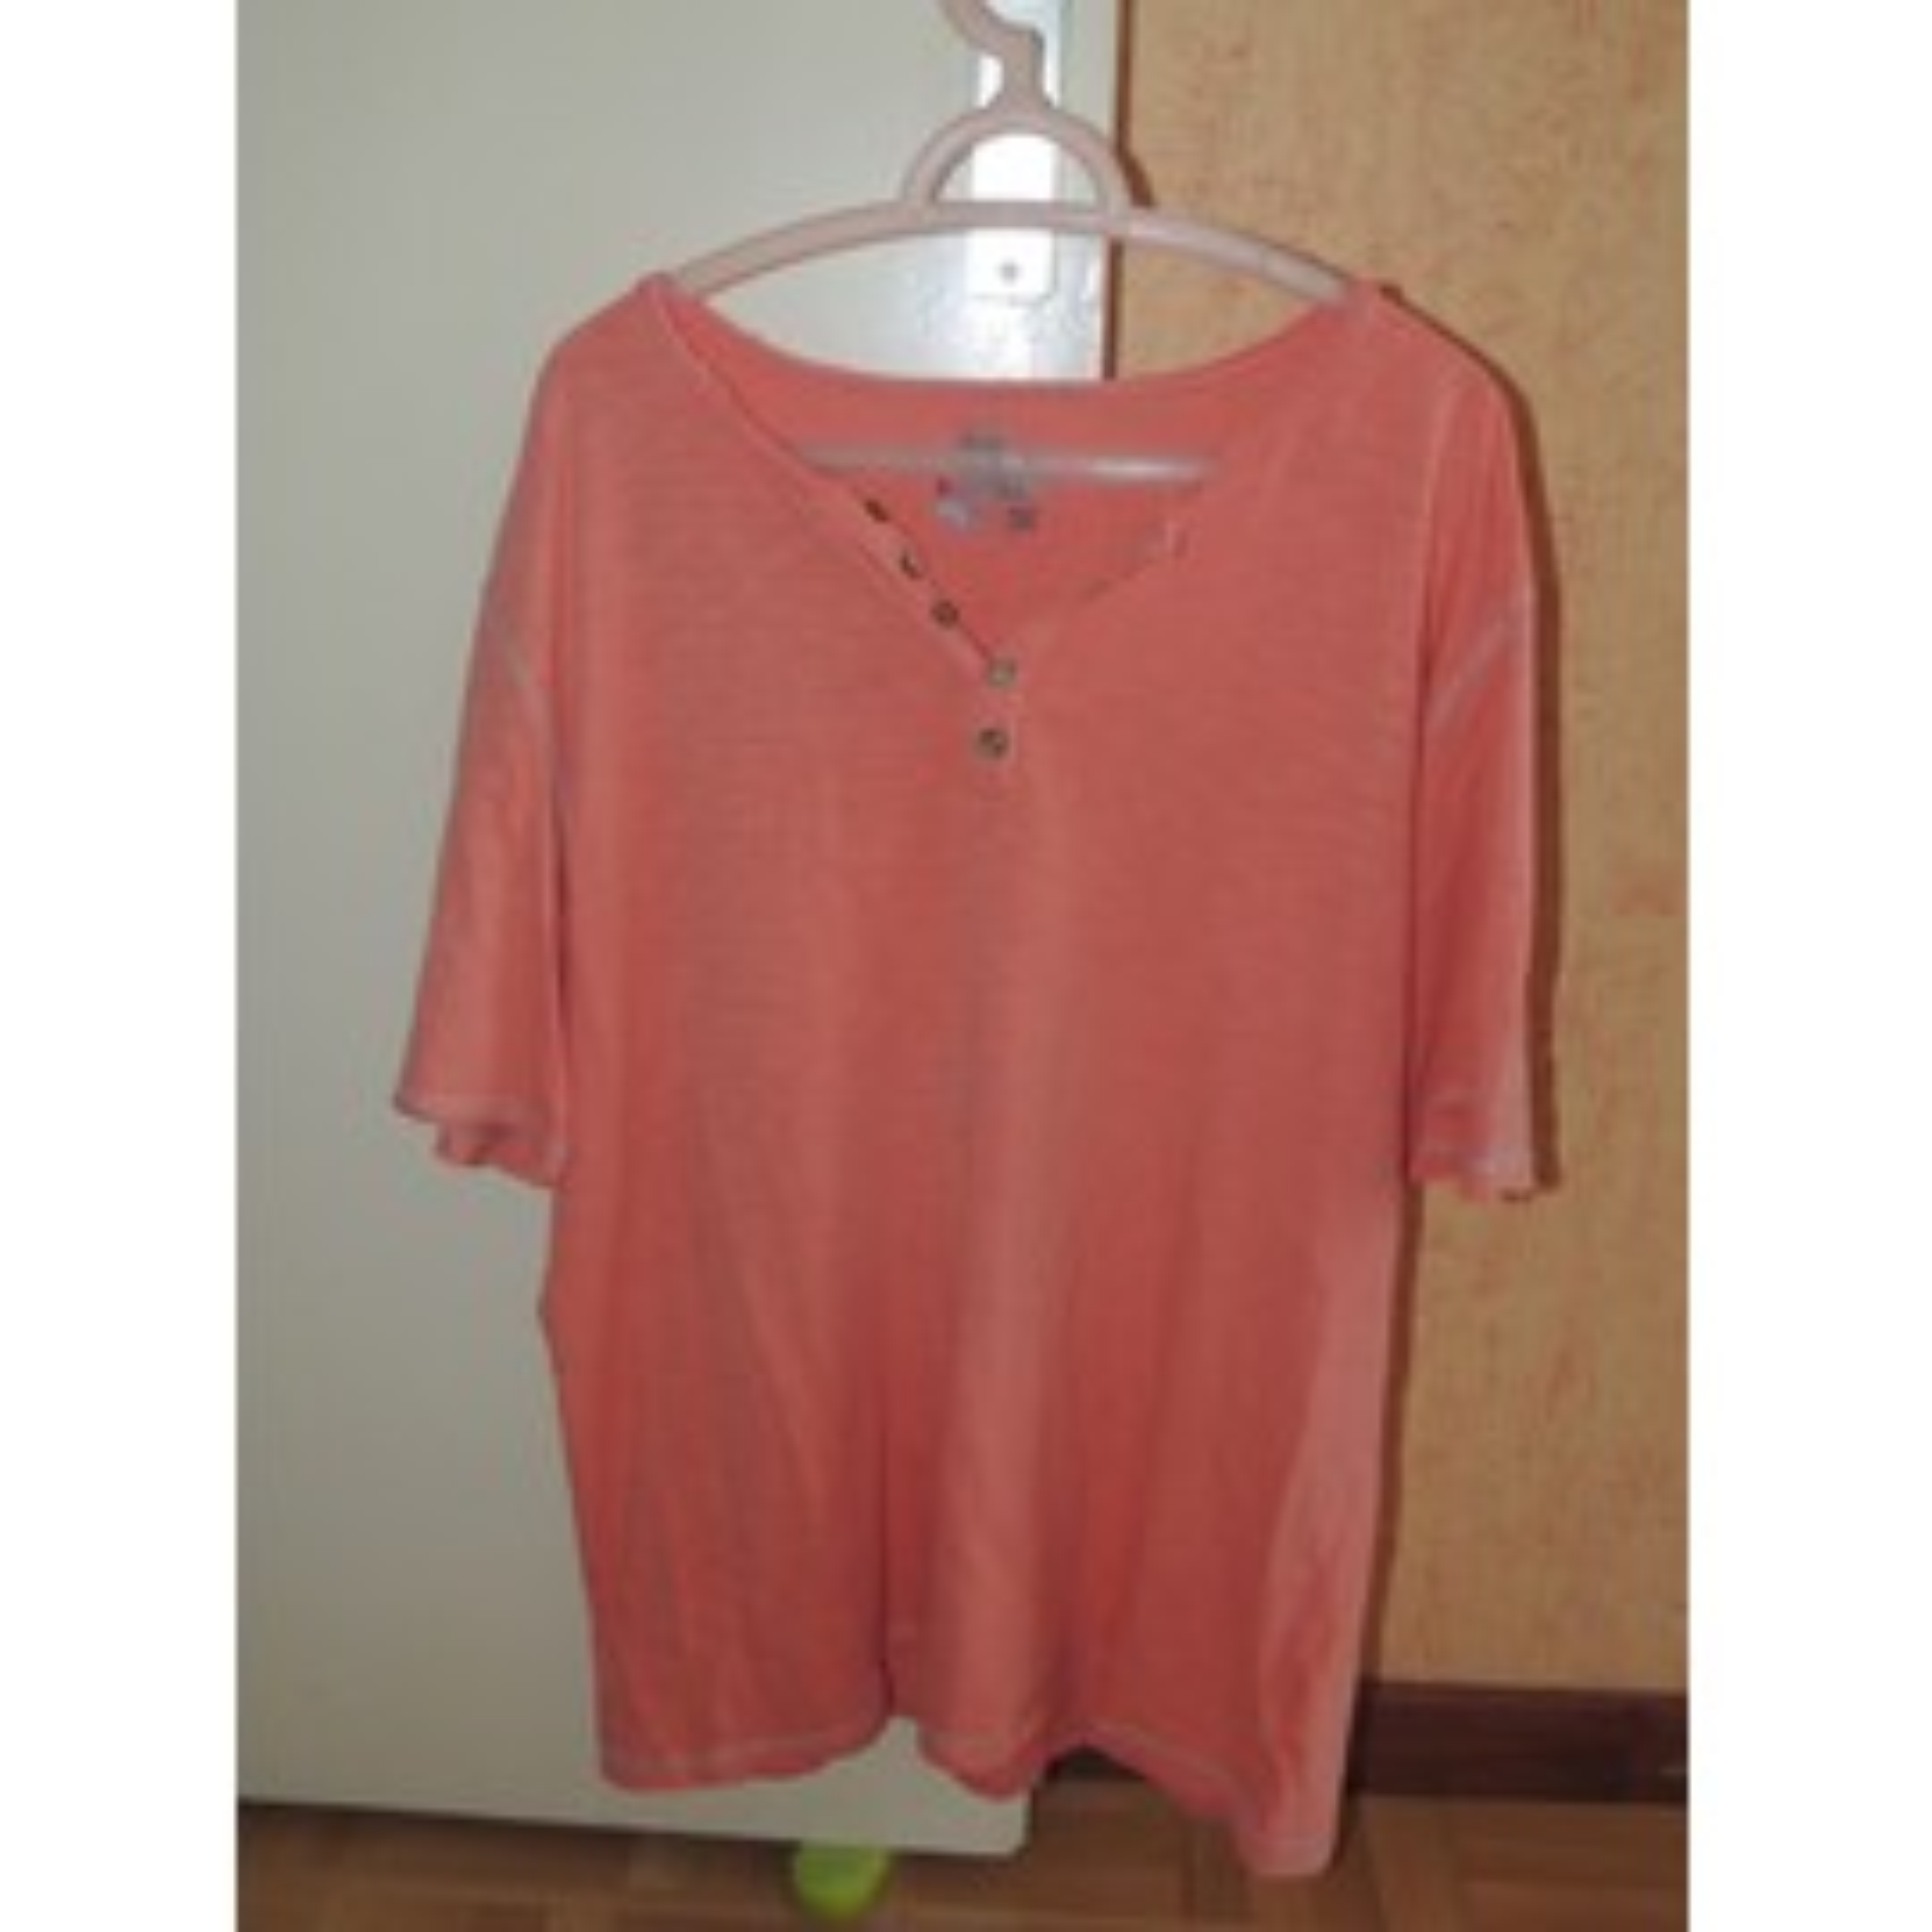 T-Shirt Armand Thiery Saumon En Coton